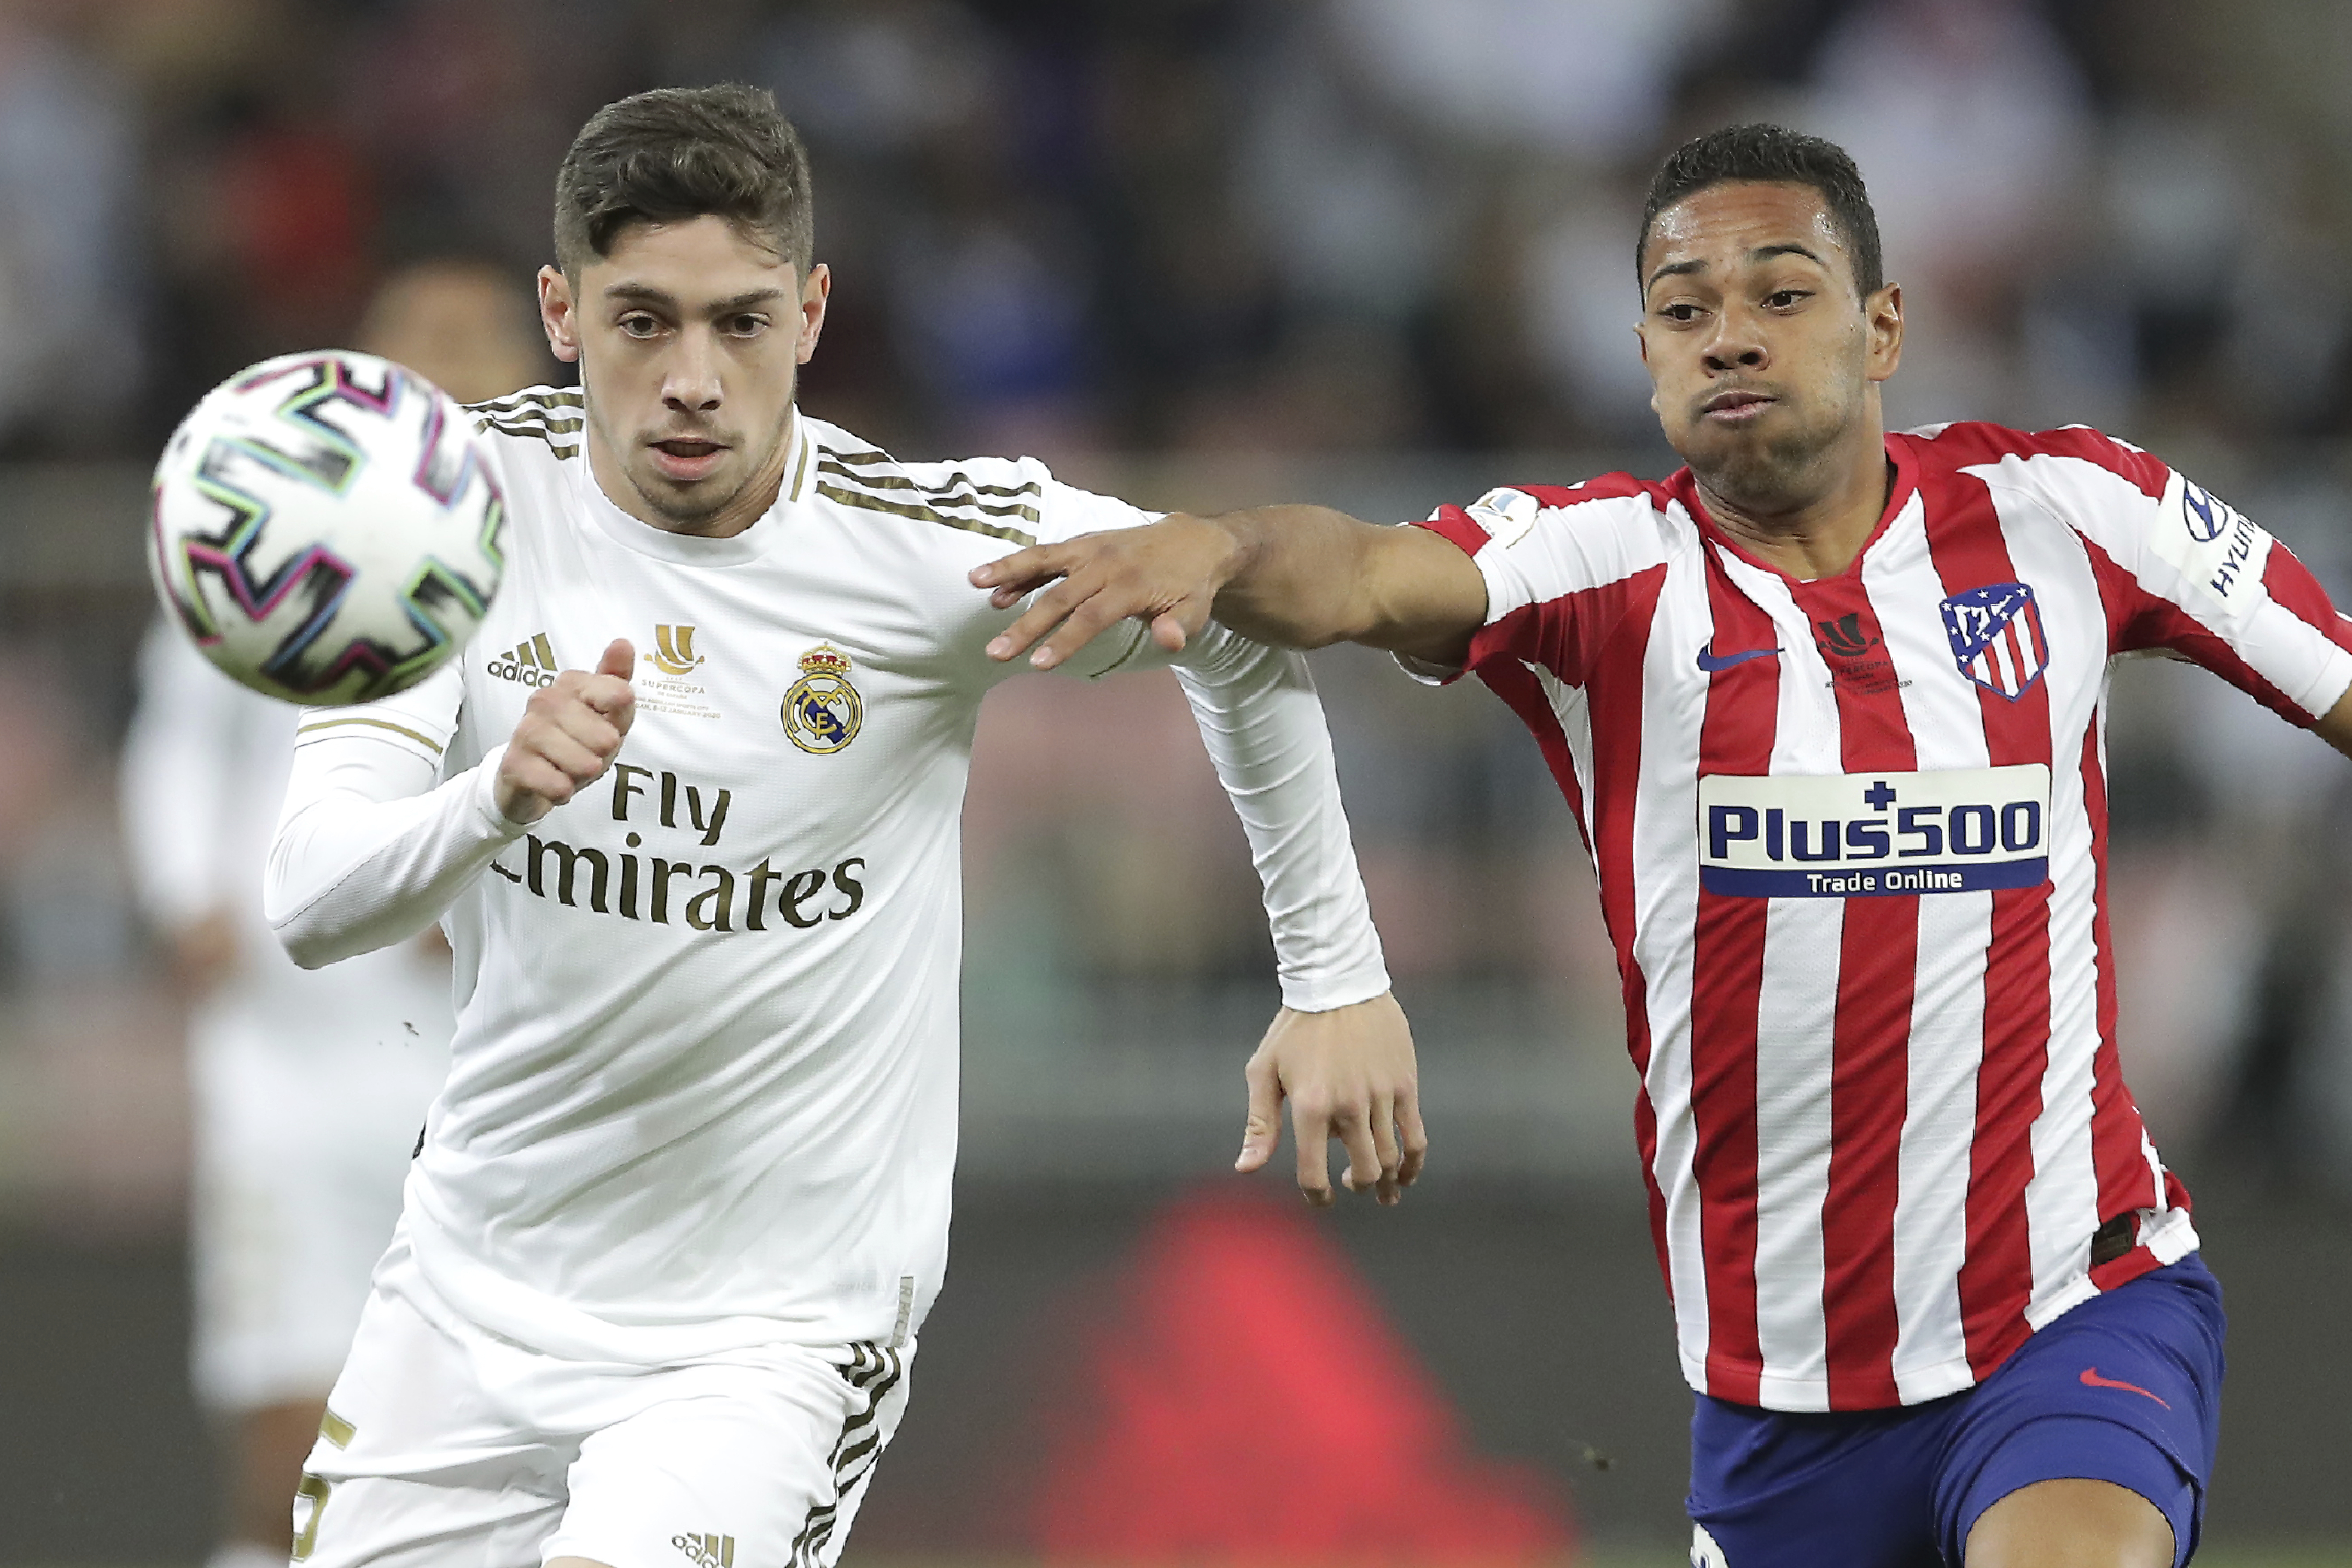 Real Madrid Vs Atletico Madrid Free Live Stream 2 1 20 Watch